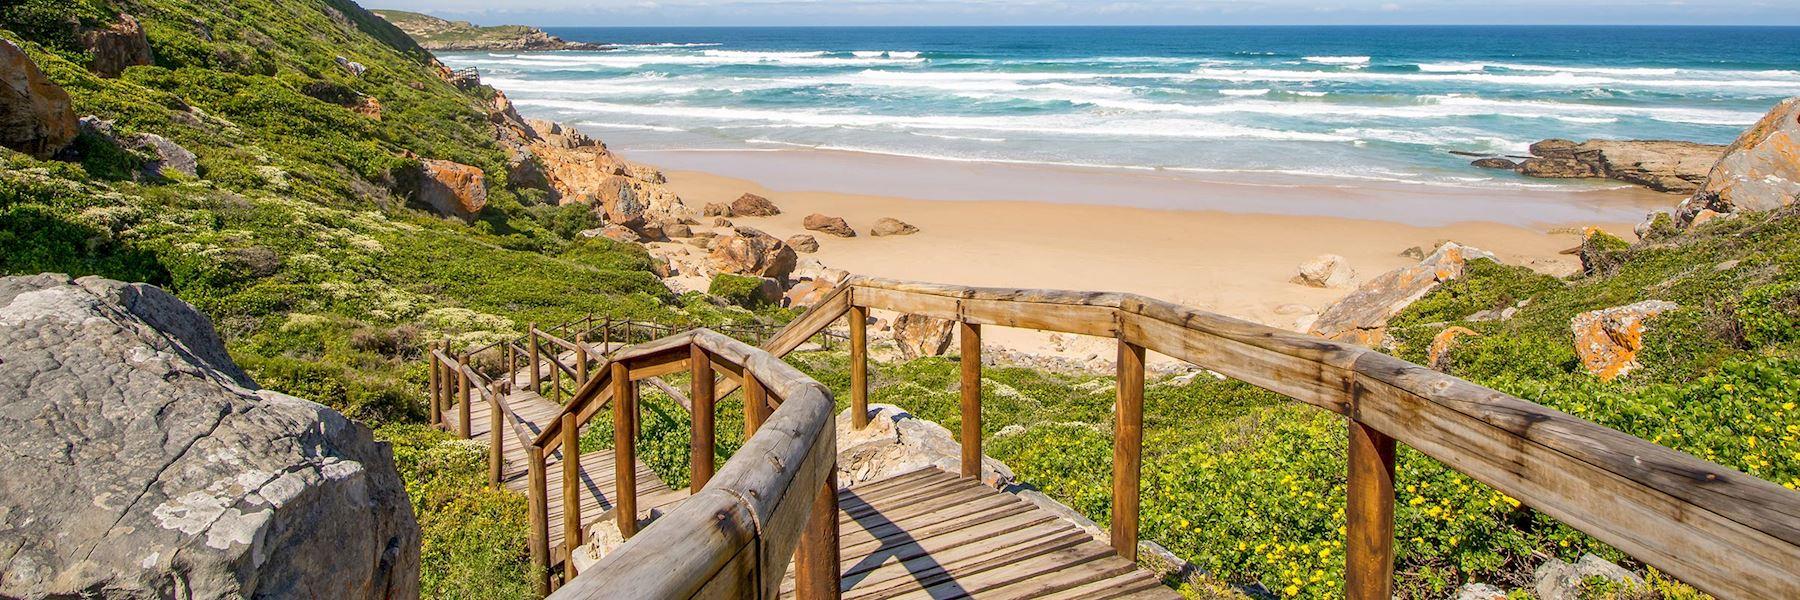 Visit Plettenberg Bay, South Africa